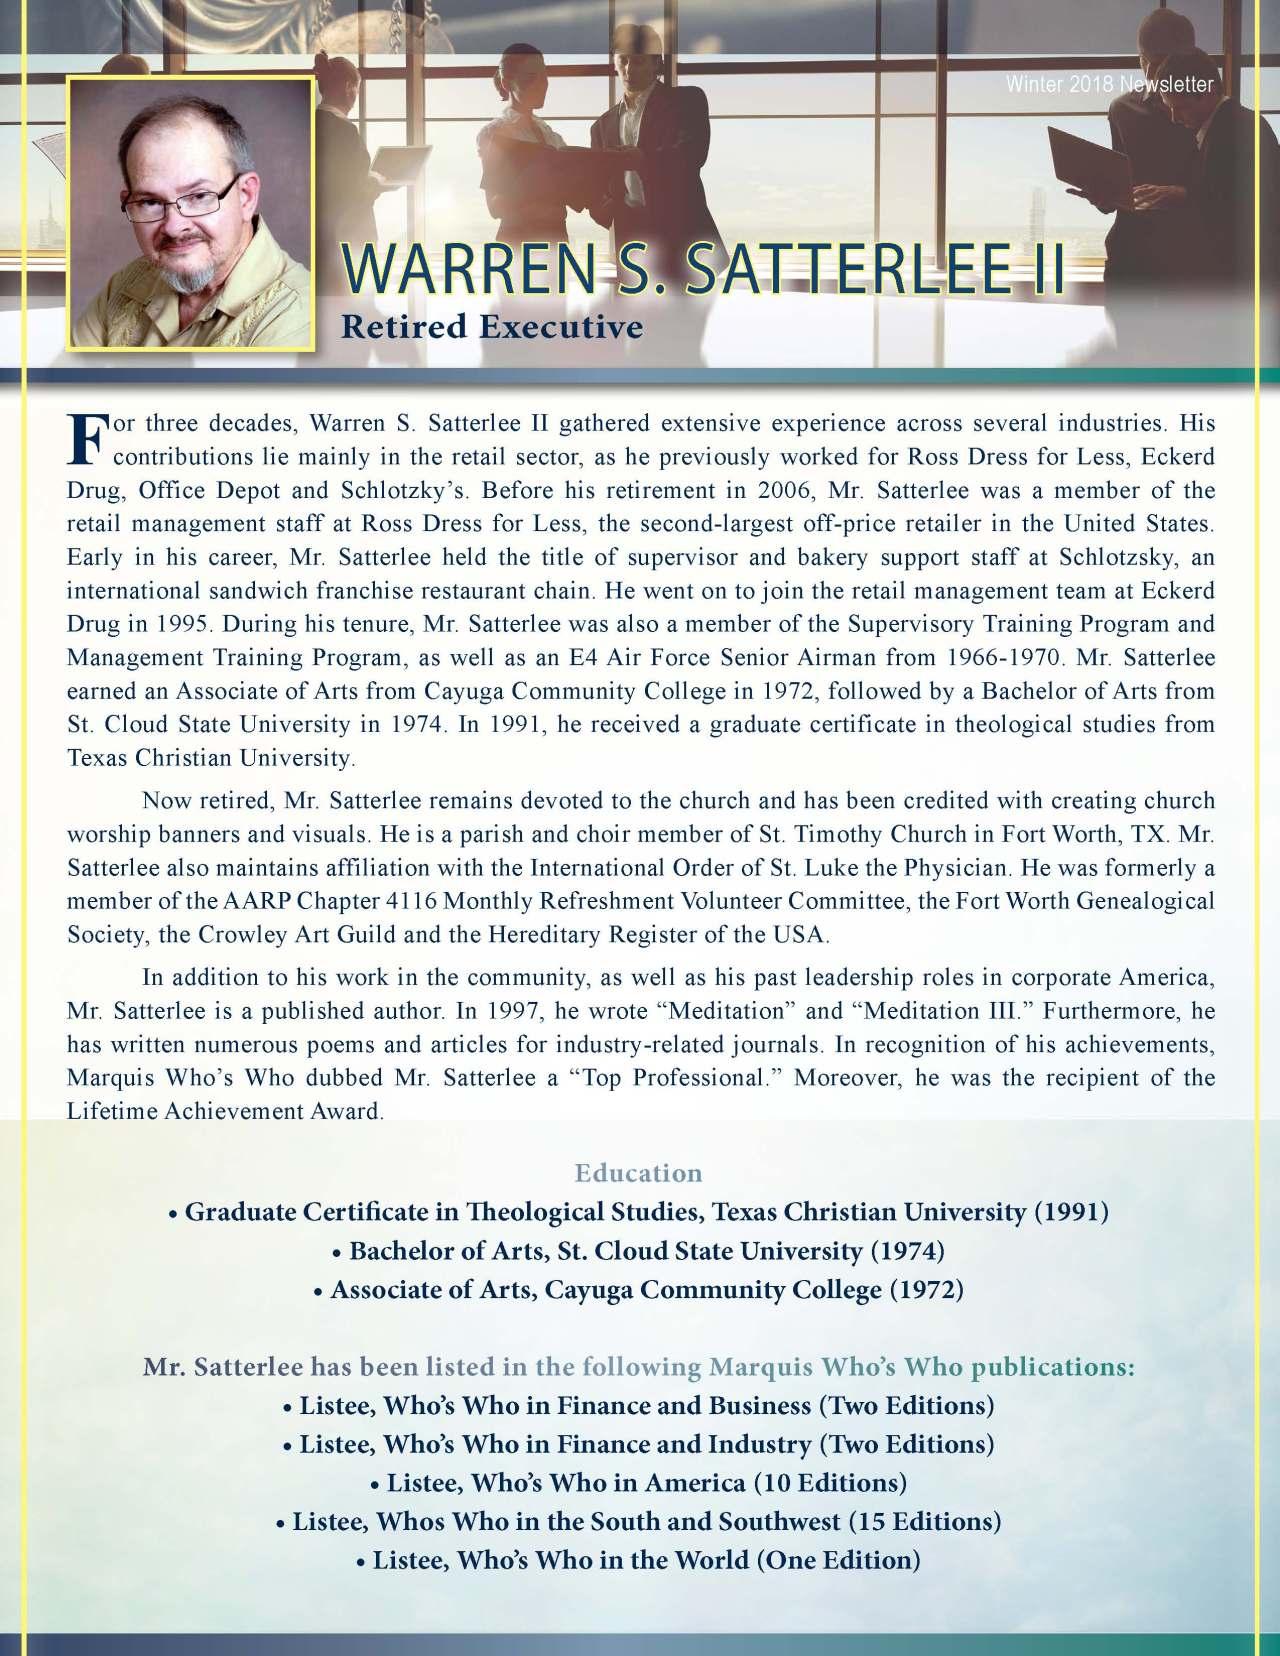 Satterlee, Warren 2188690_27619378 Newsletter REVISED